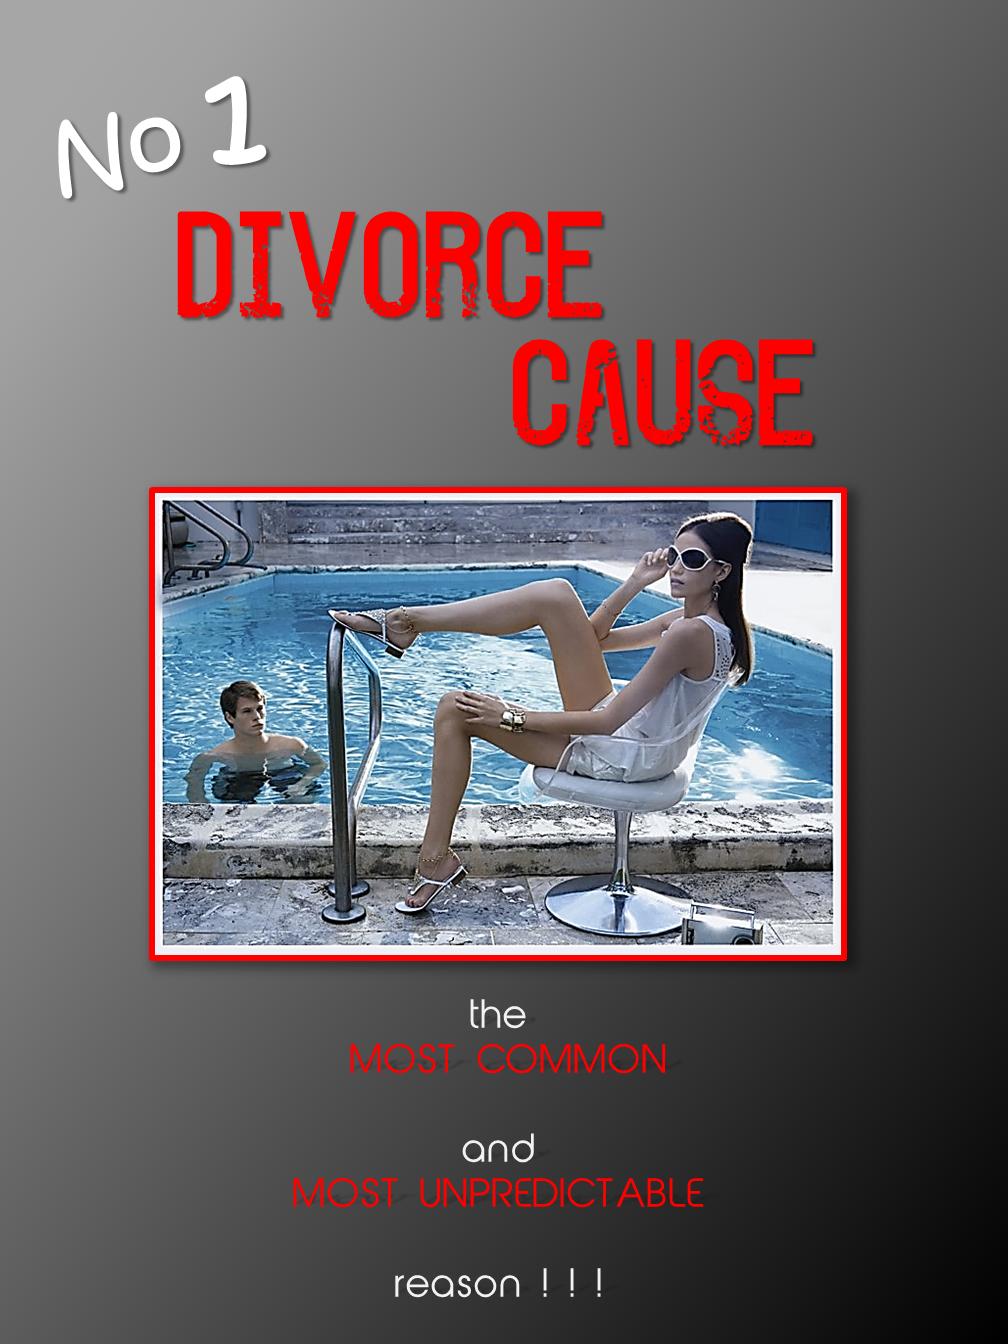 Divorce Cause